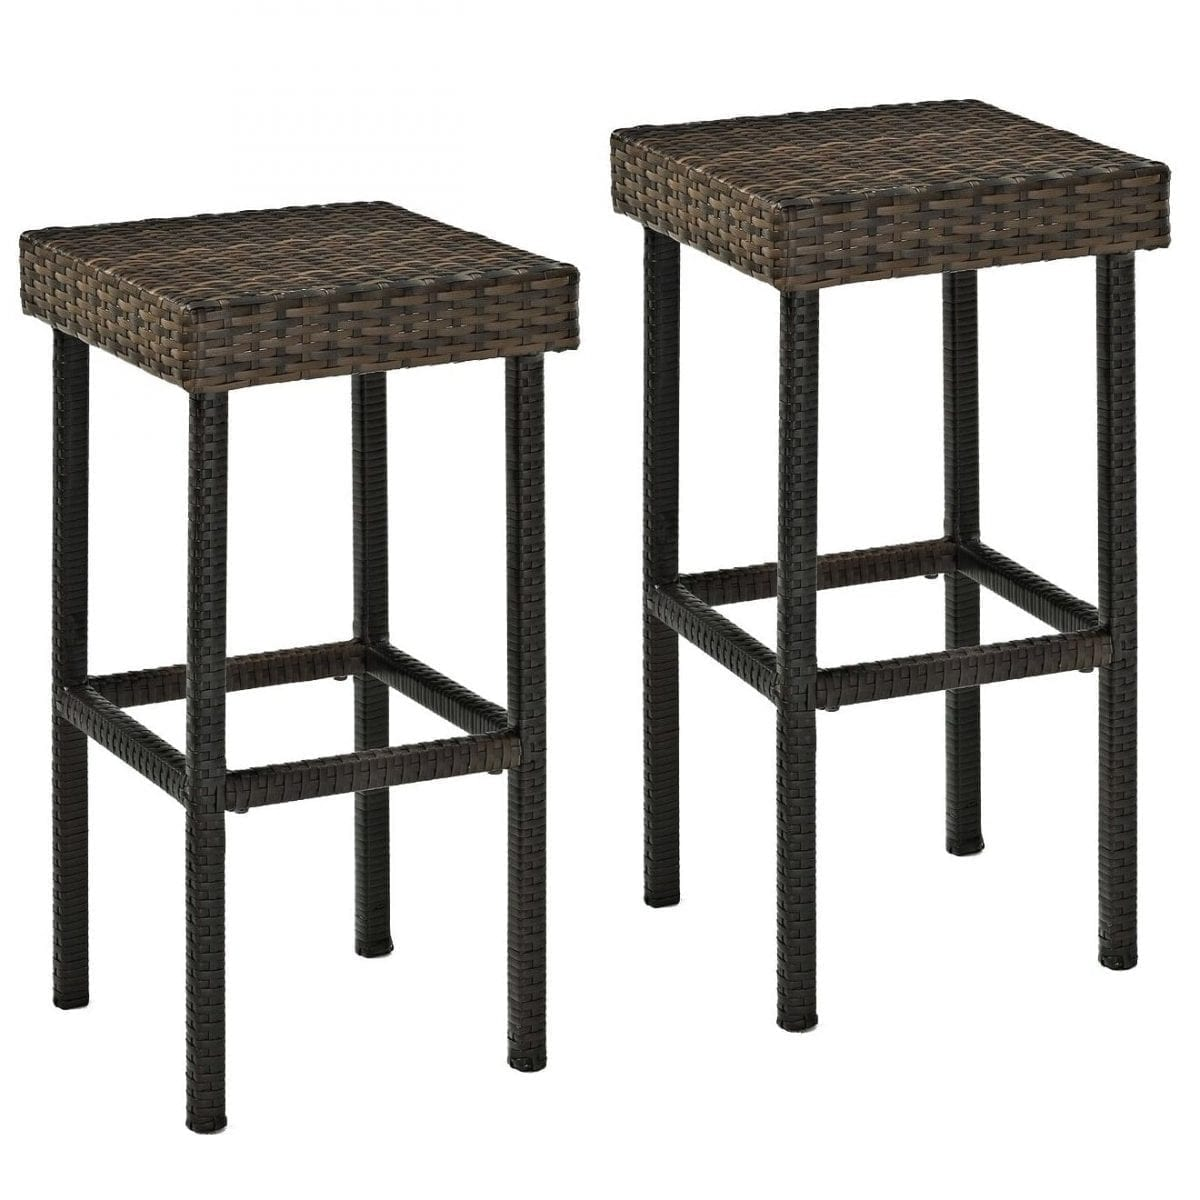 crosley-furniture-palm-harbor-outdoor-wicker-bar-stool Best Wicker Bar Stools